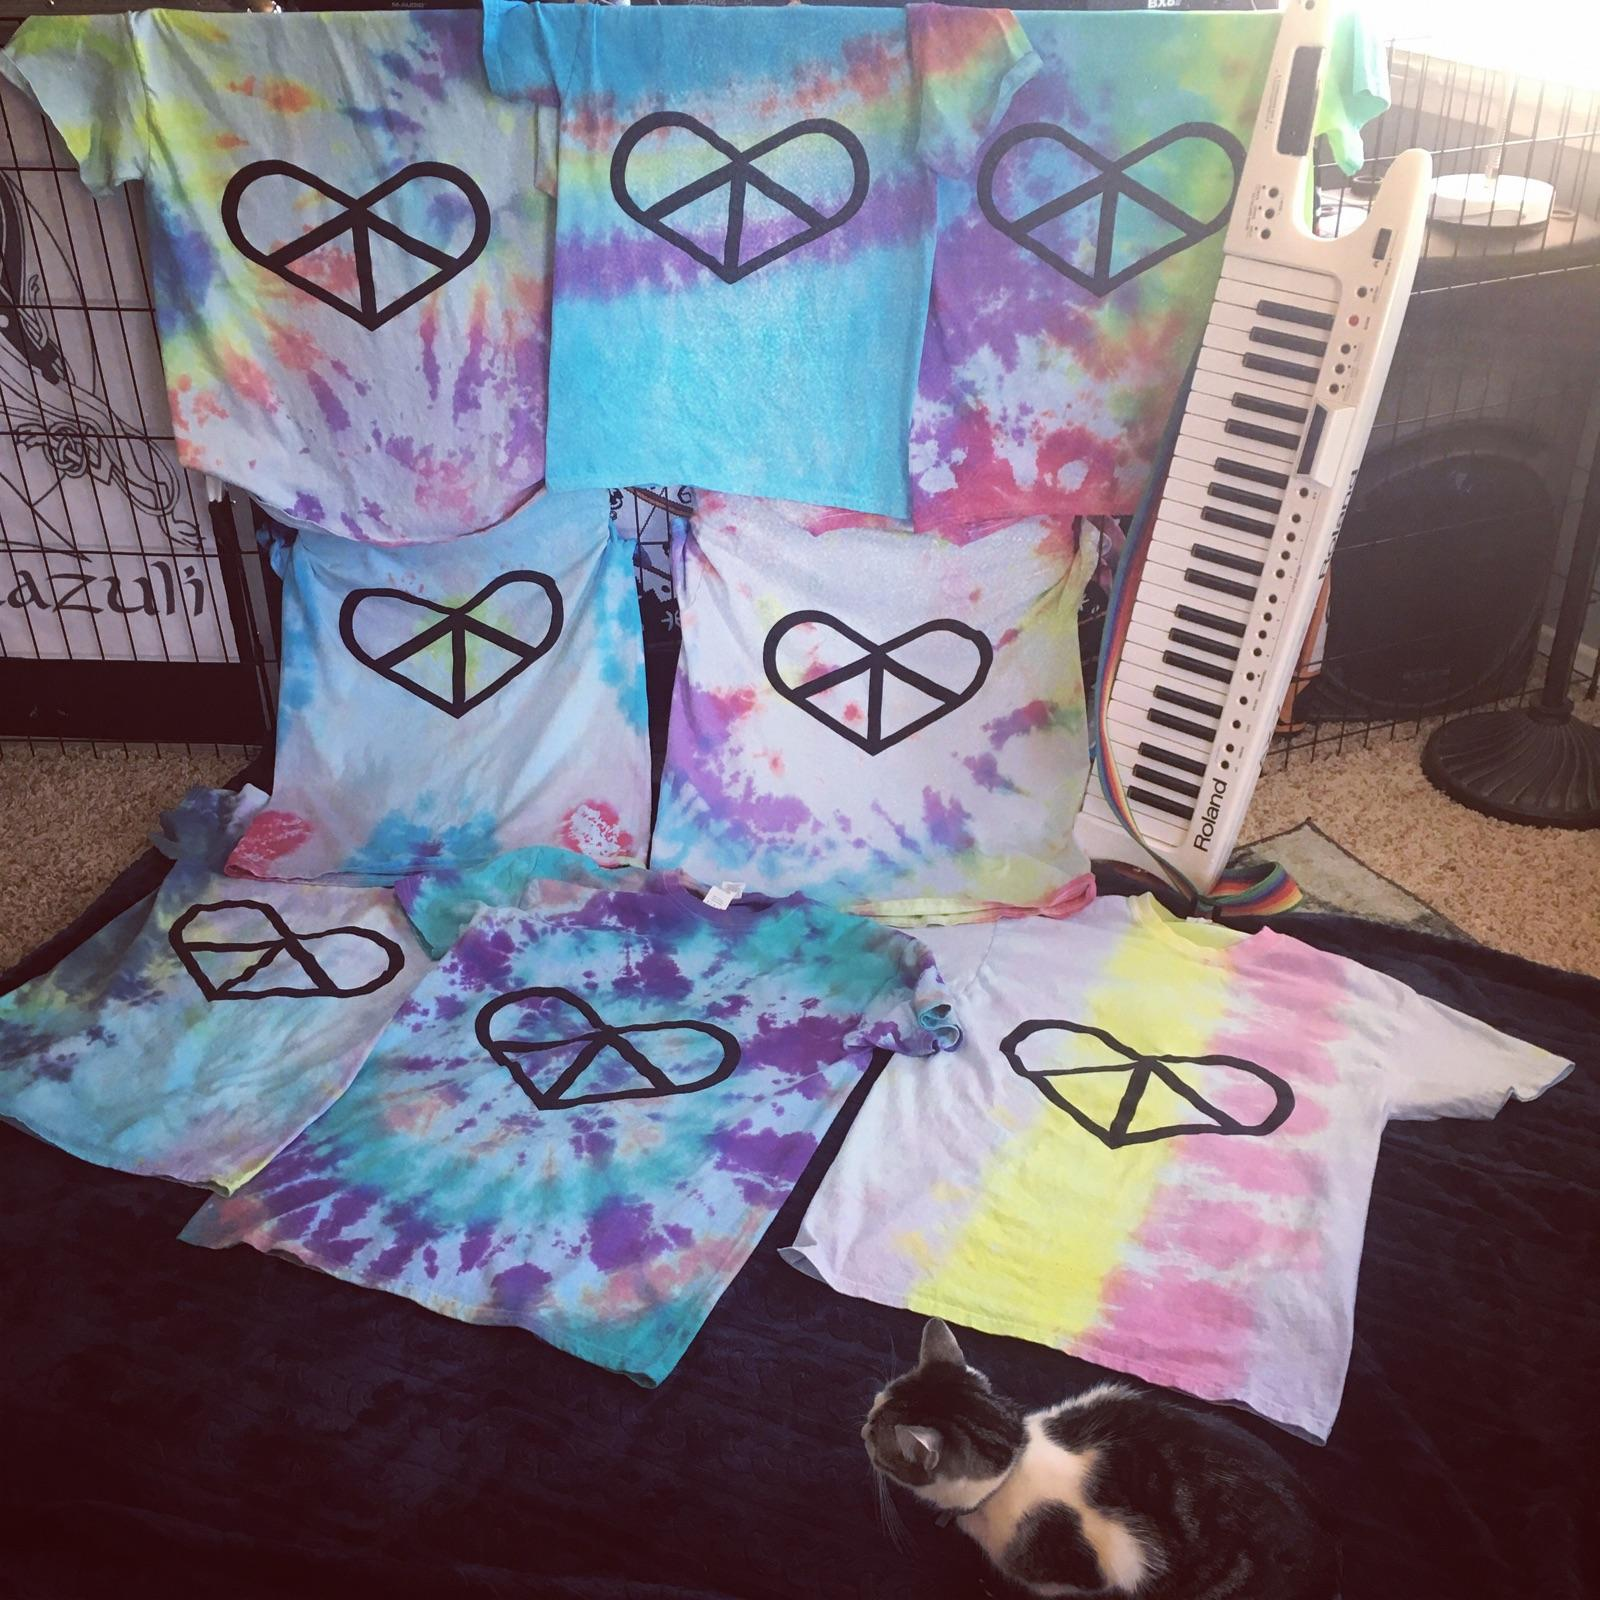 Amanda Darling Tye Dye Shirt